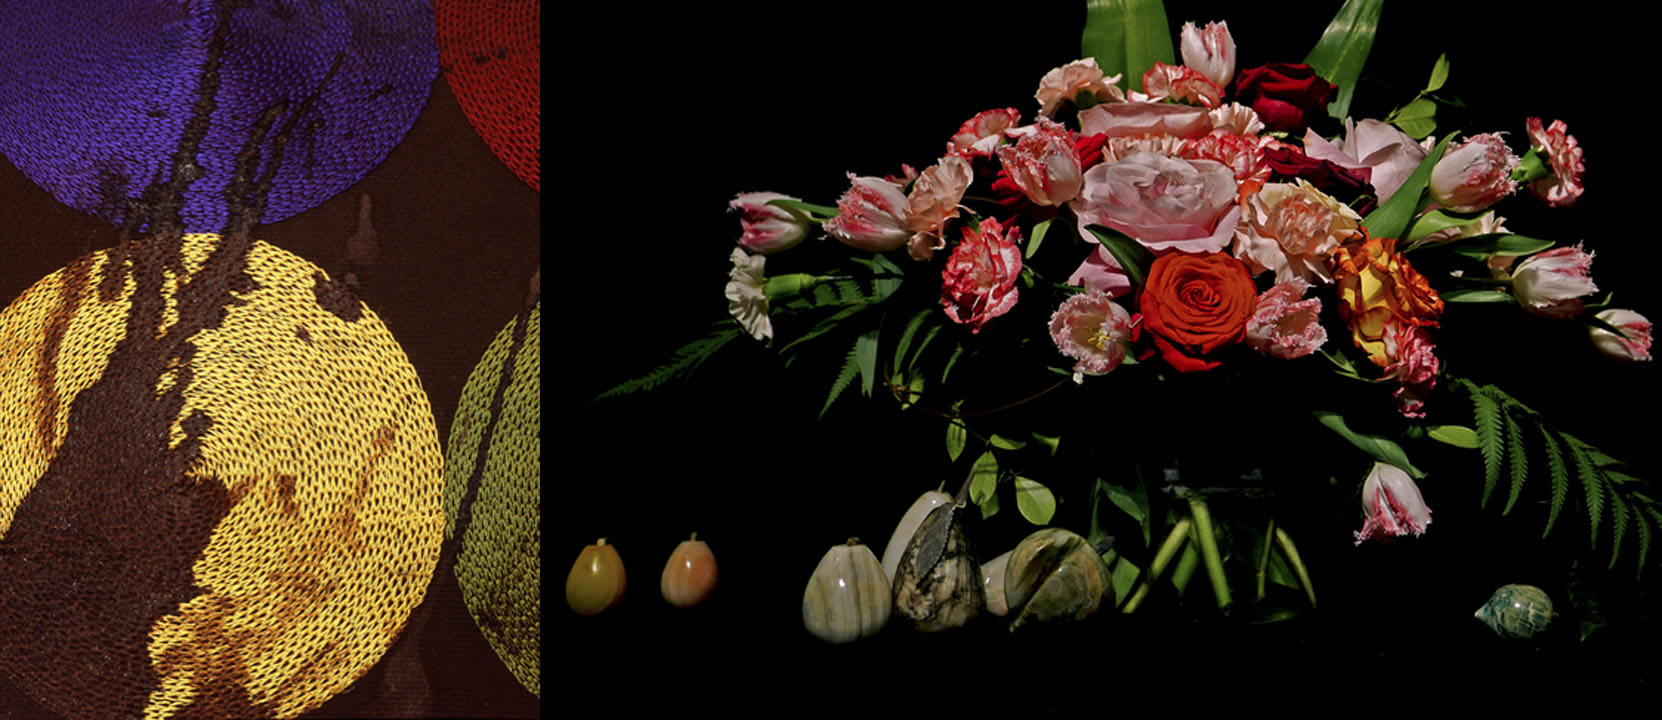 (L) Sarah Sudhoff,  Murder, Male , 40 years old (I), 2010. Archival Pigment Print, 40 x 30 inches. (R) Debra Barrera,  Quintanilla, Rosa , 2018. Archival pigment print.